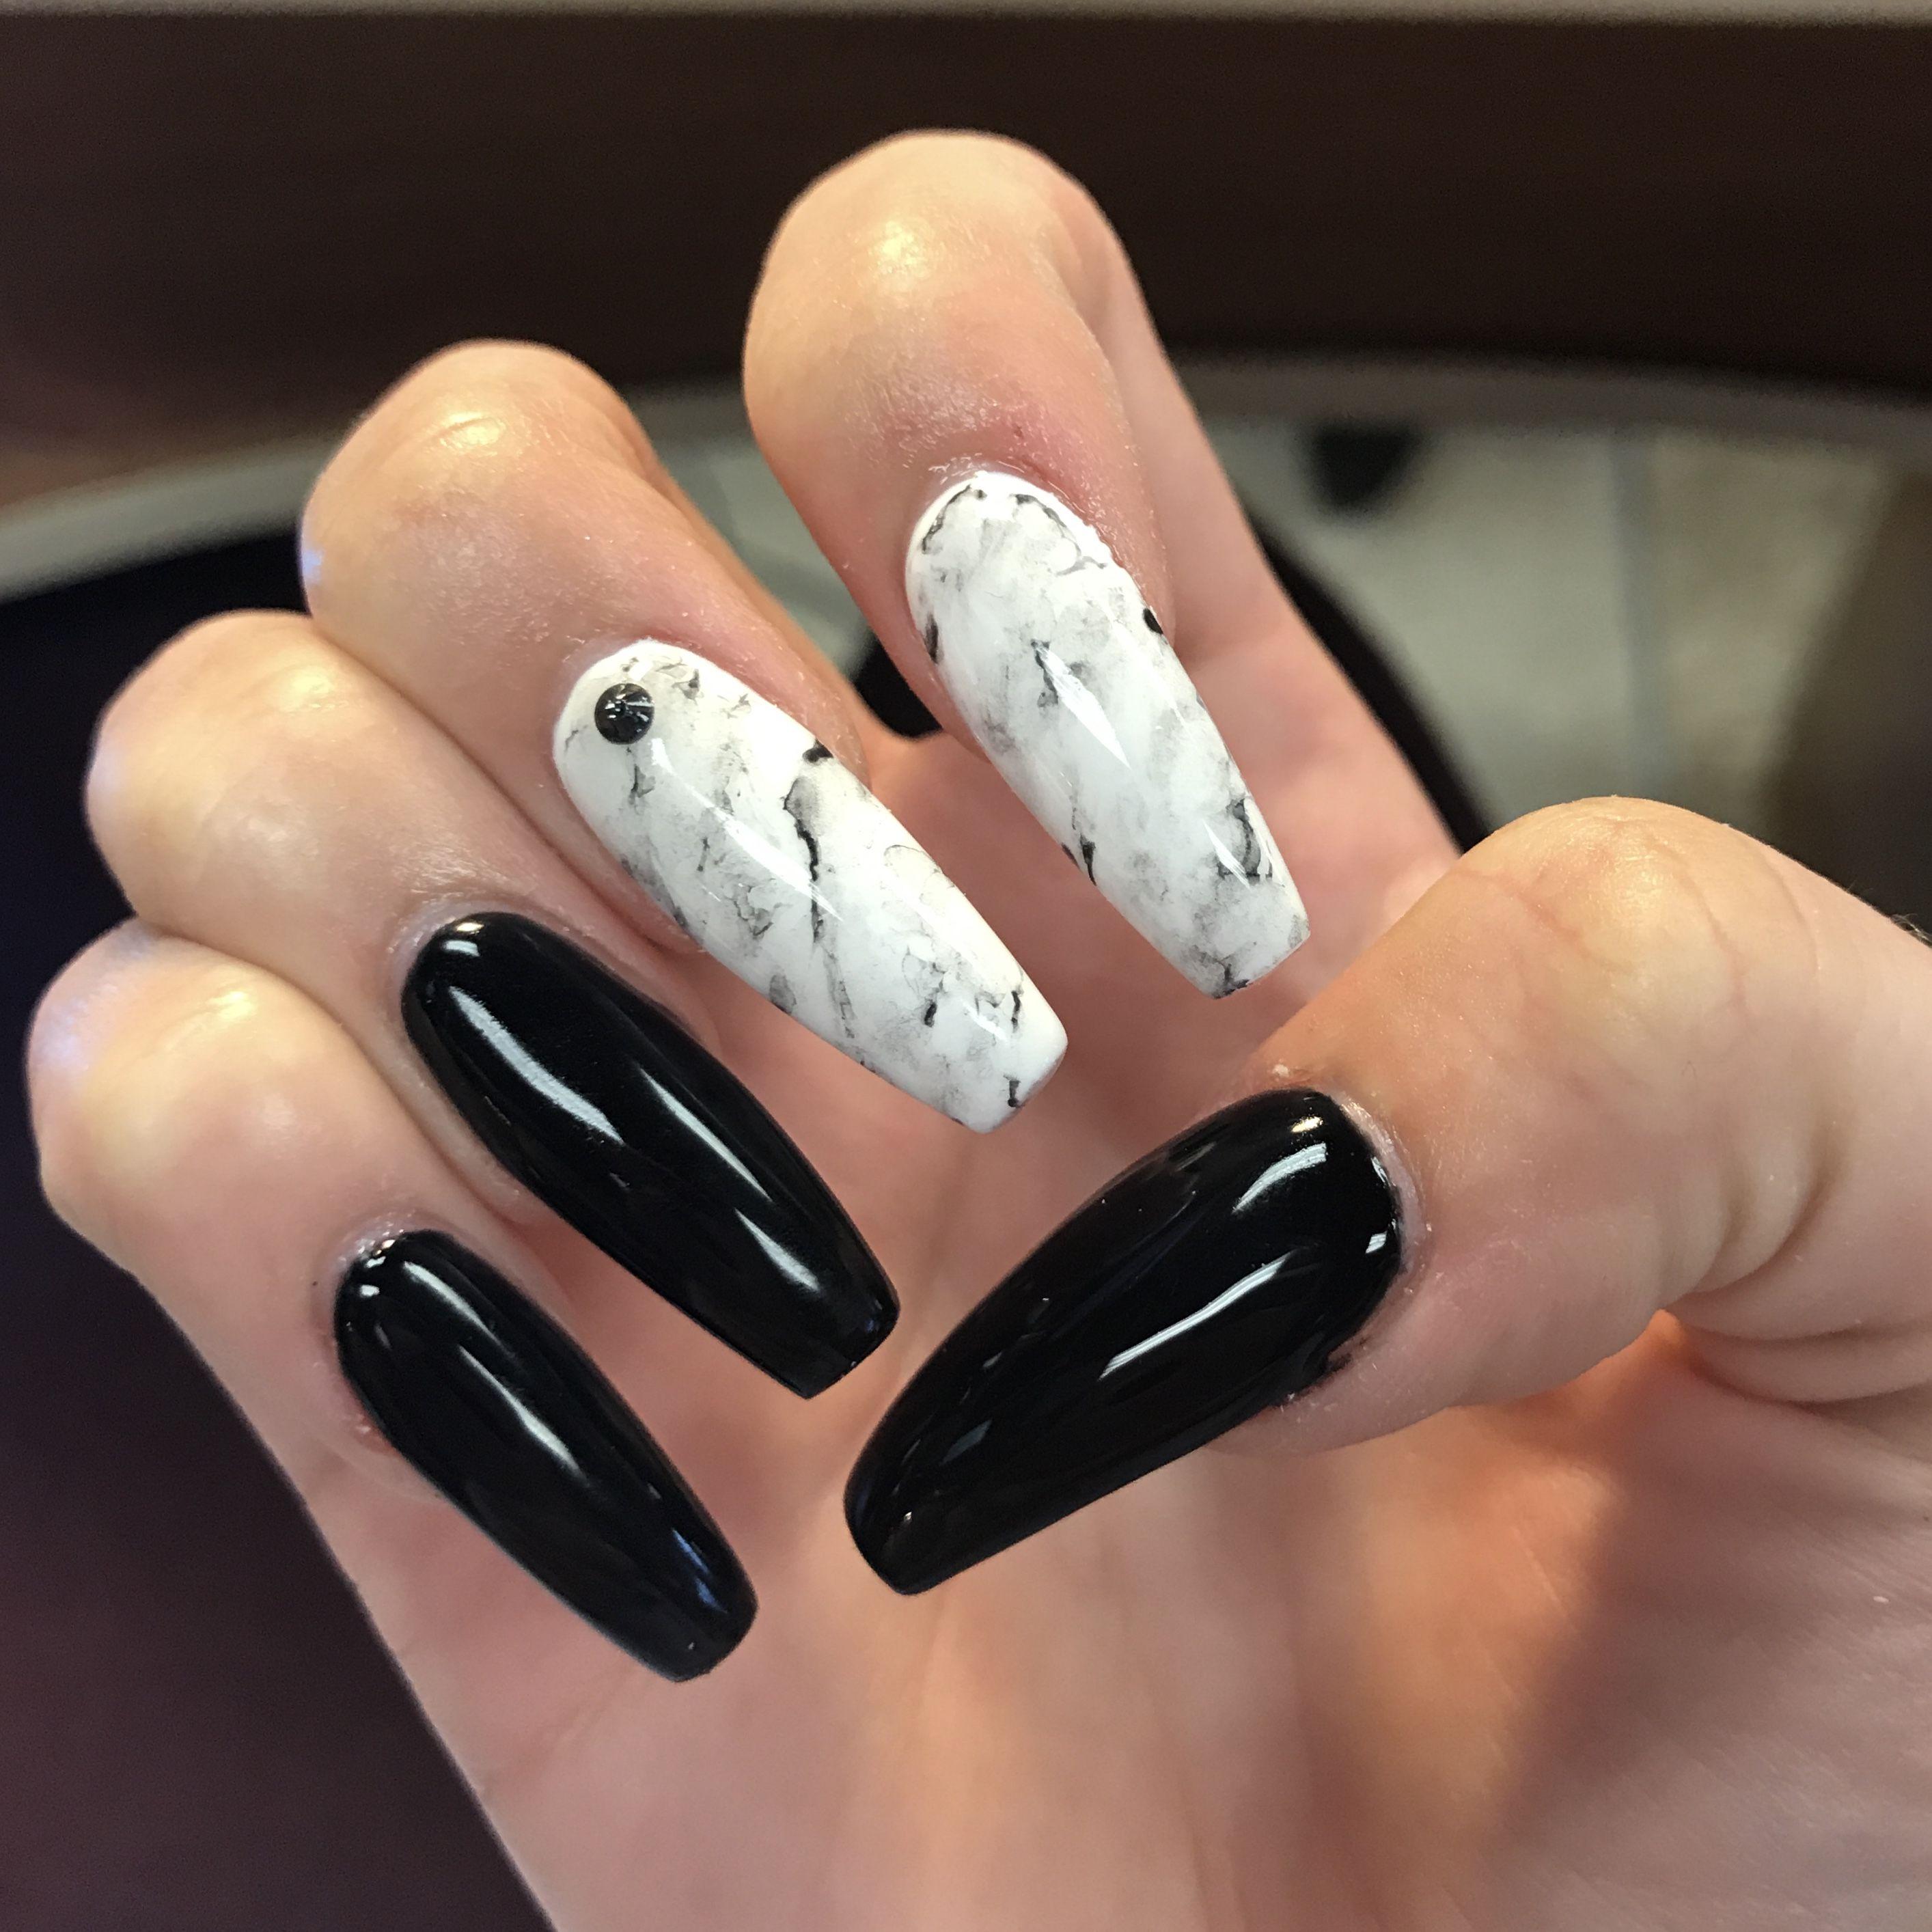 #acrylicnails #gelpainting #sandraluz   Gel polish